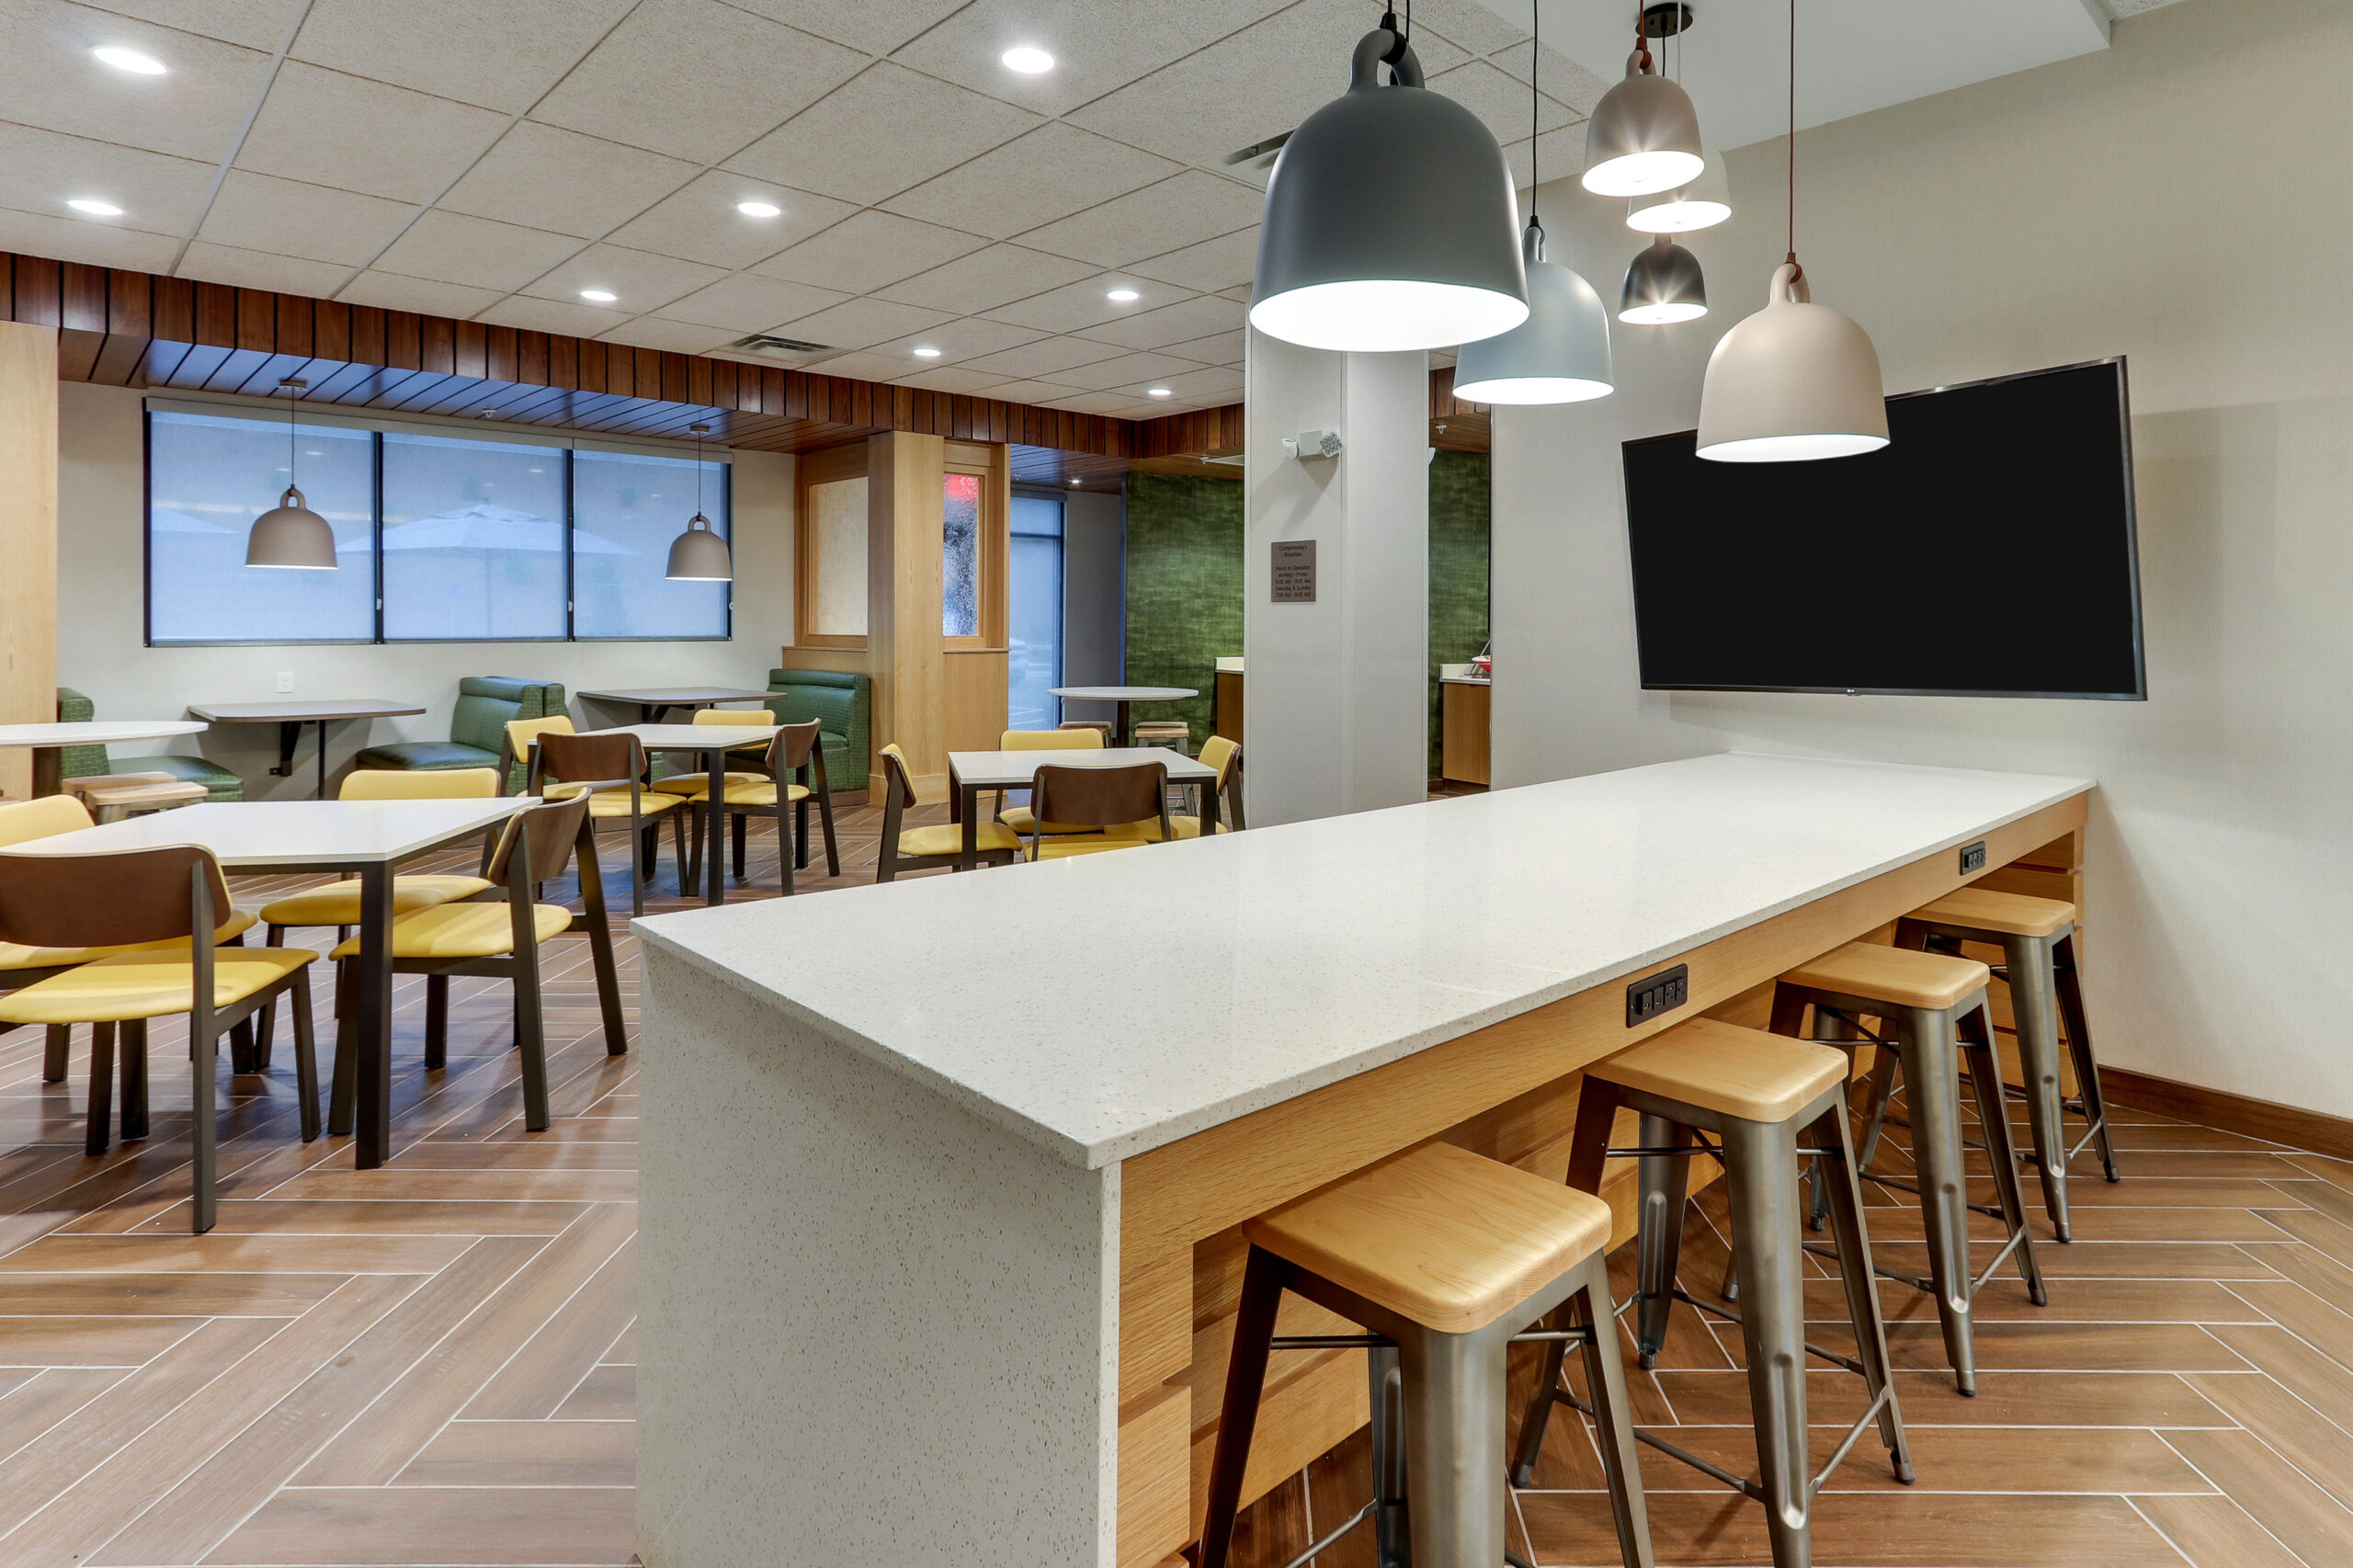 FF_AVLFW_Dining Area 02